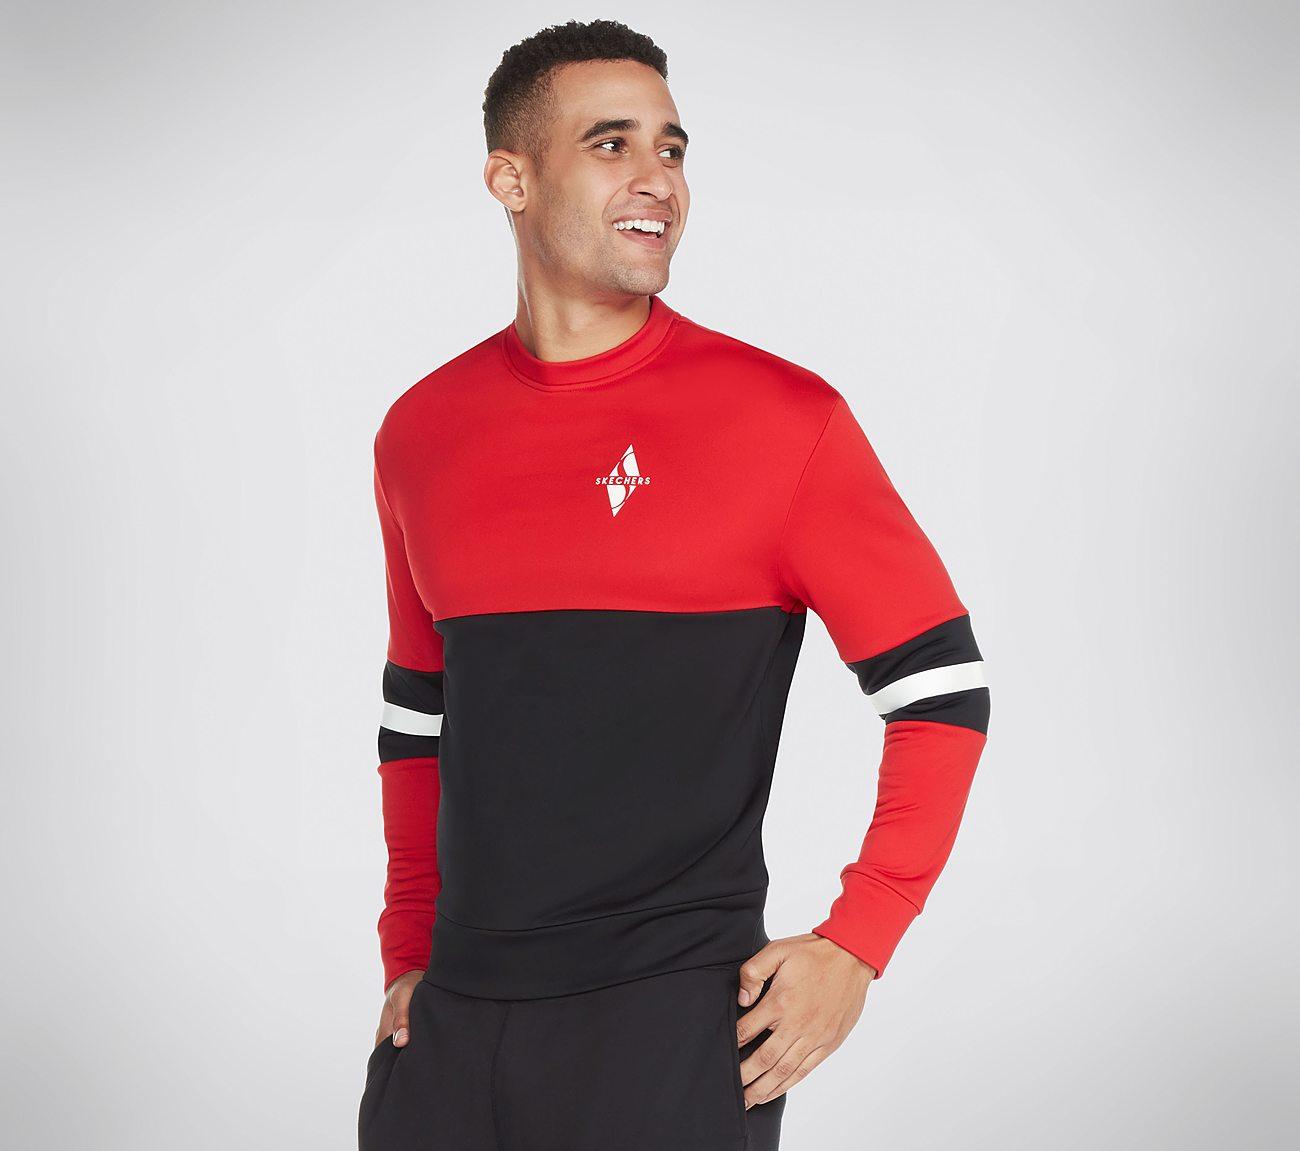 Skechers Apparel Legacy Crew Shirt